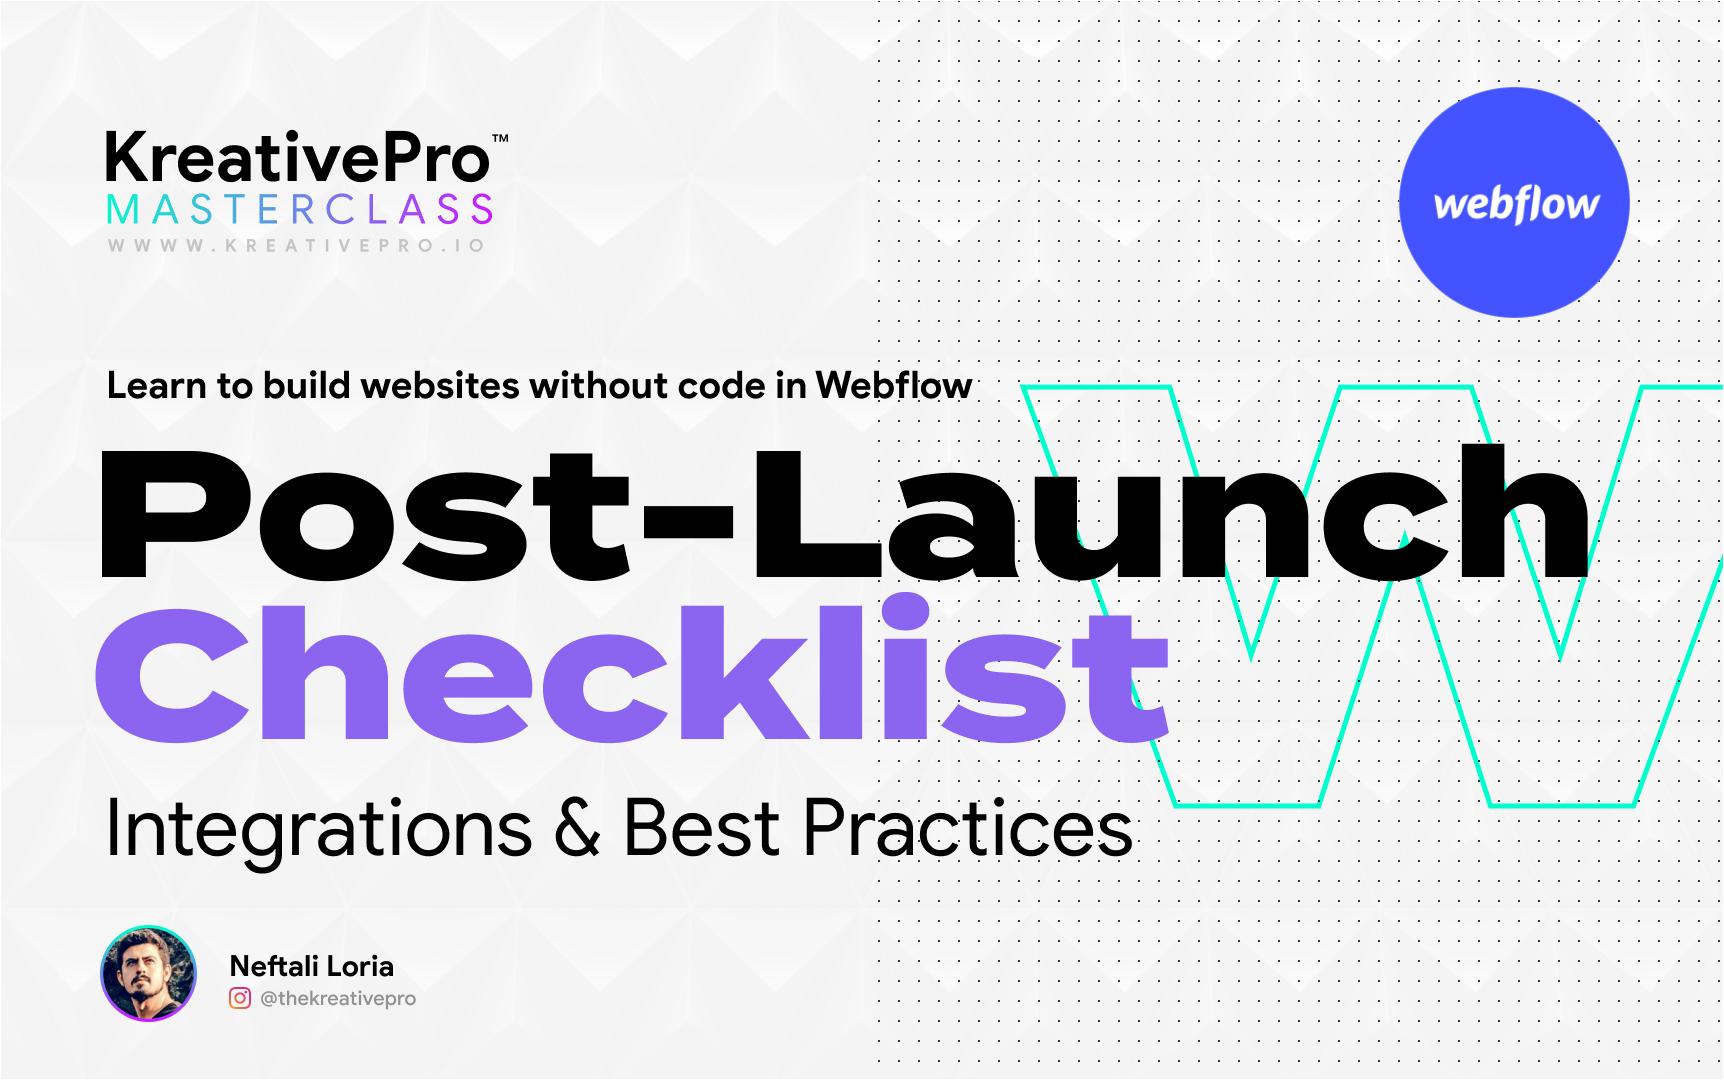 Webflow 7.5 - Post-Launch Checklist